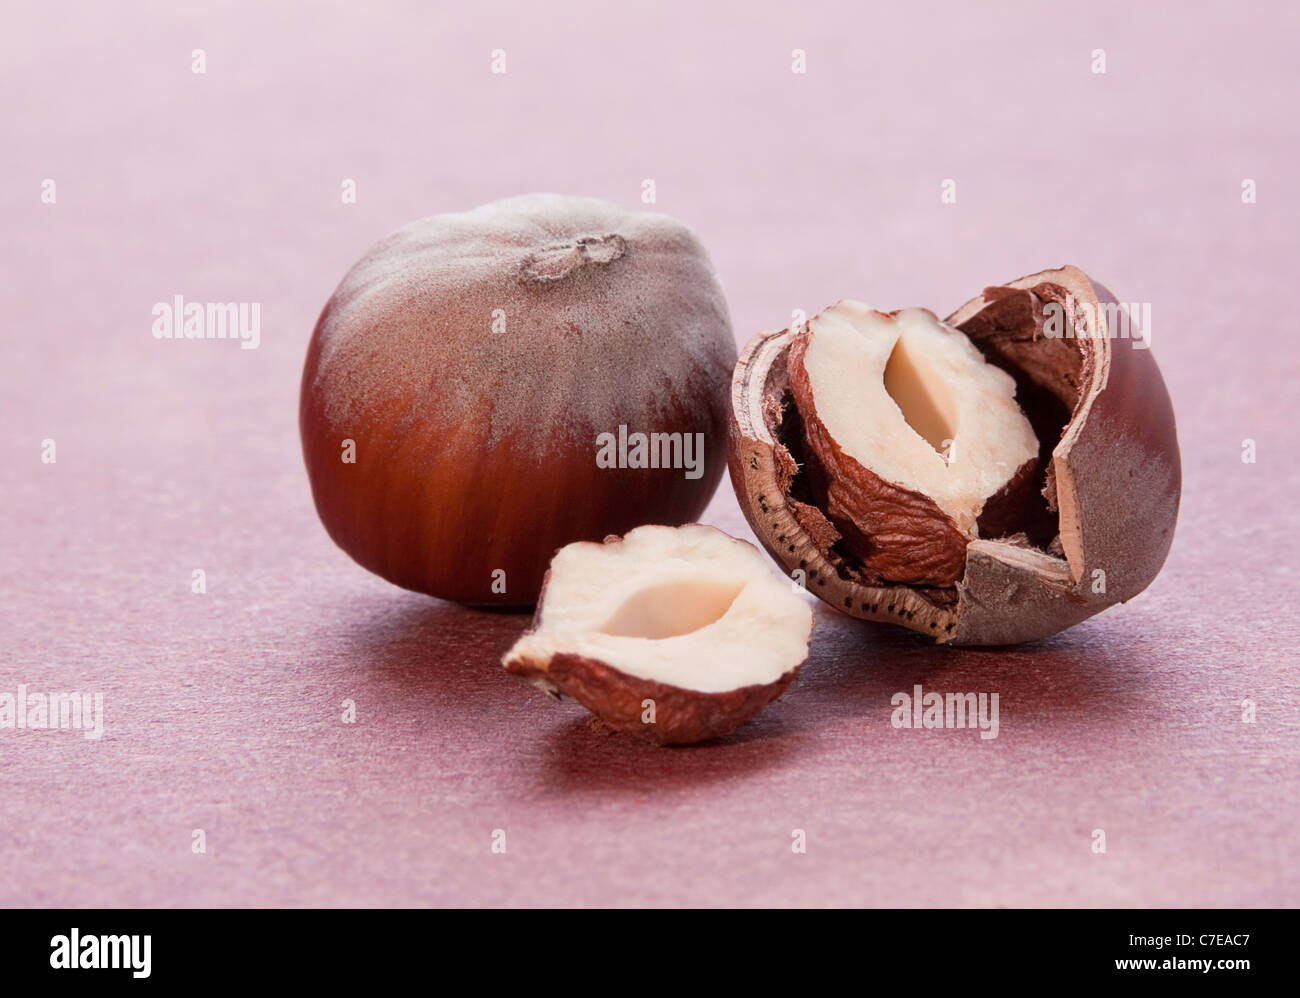 Hazelnut nut closeup with shadow on red background - Stock Image